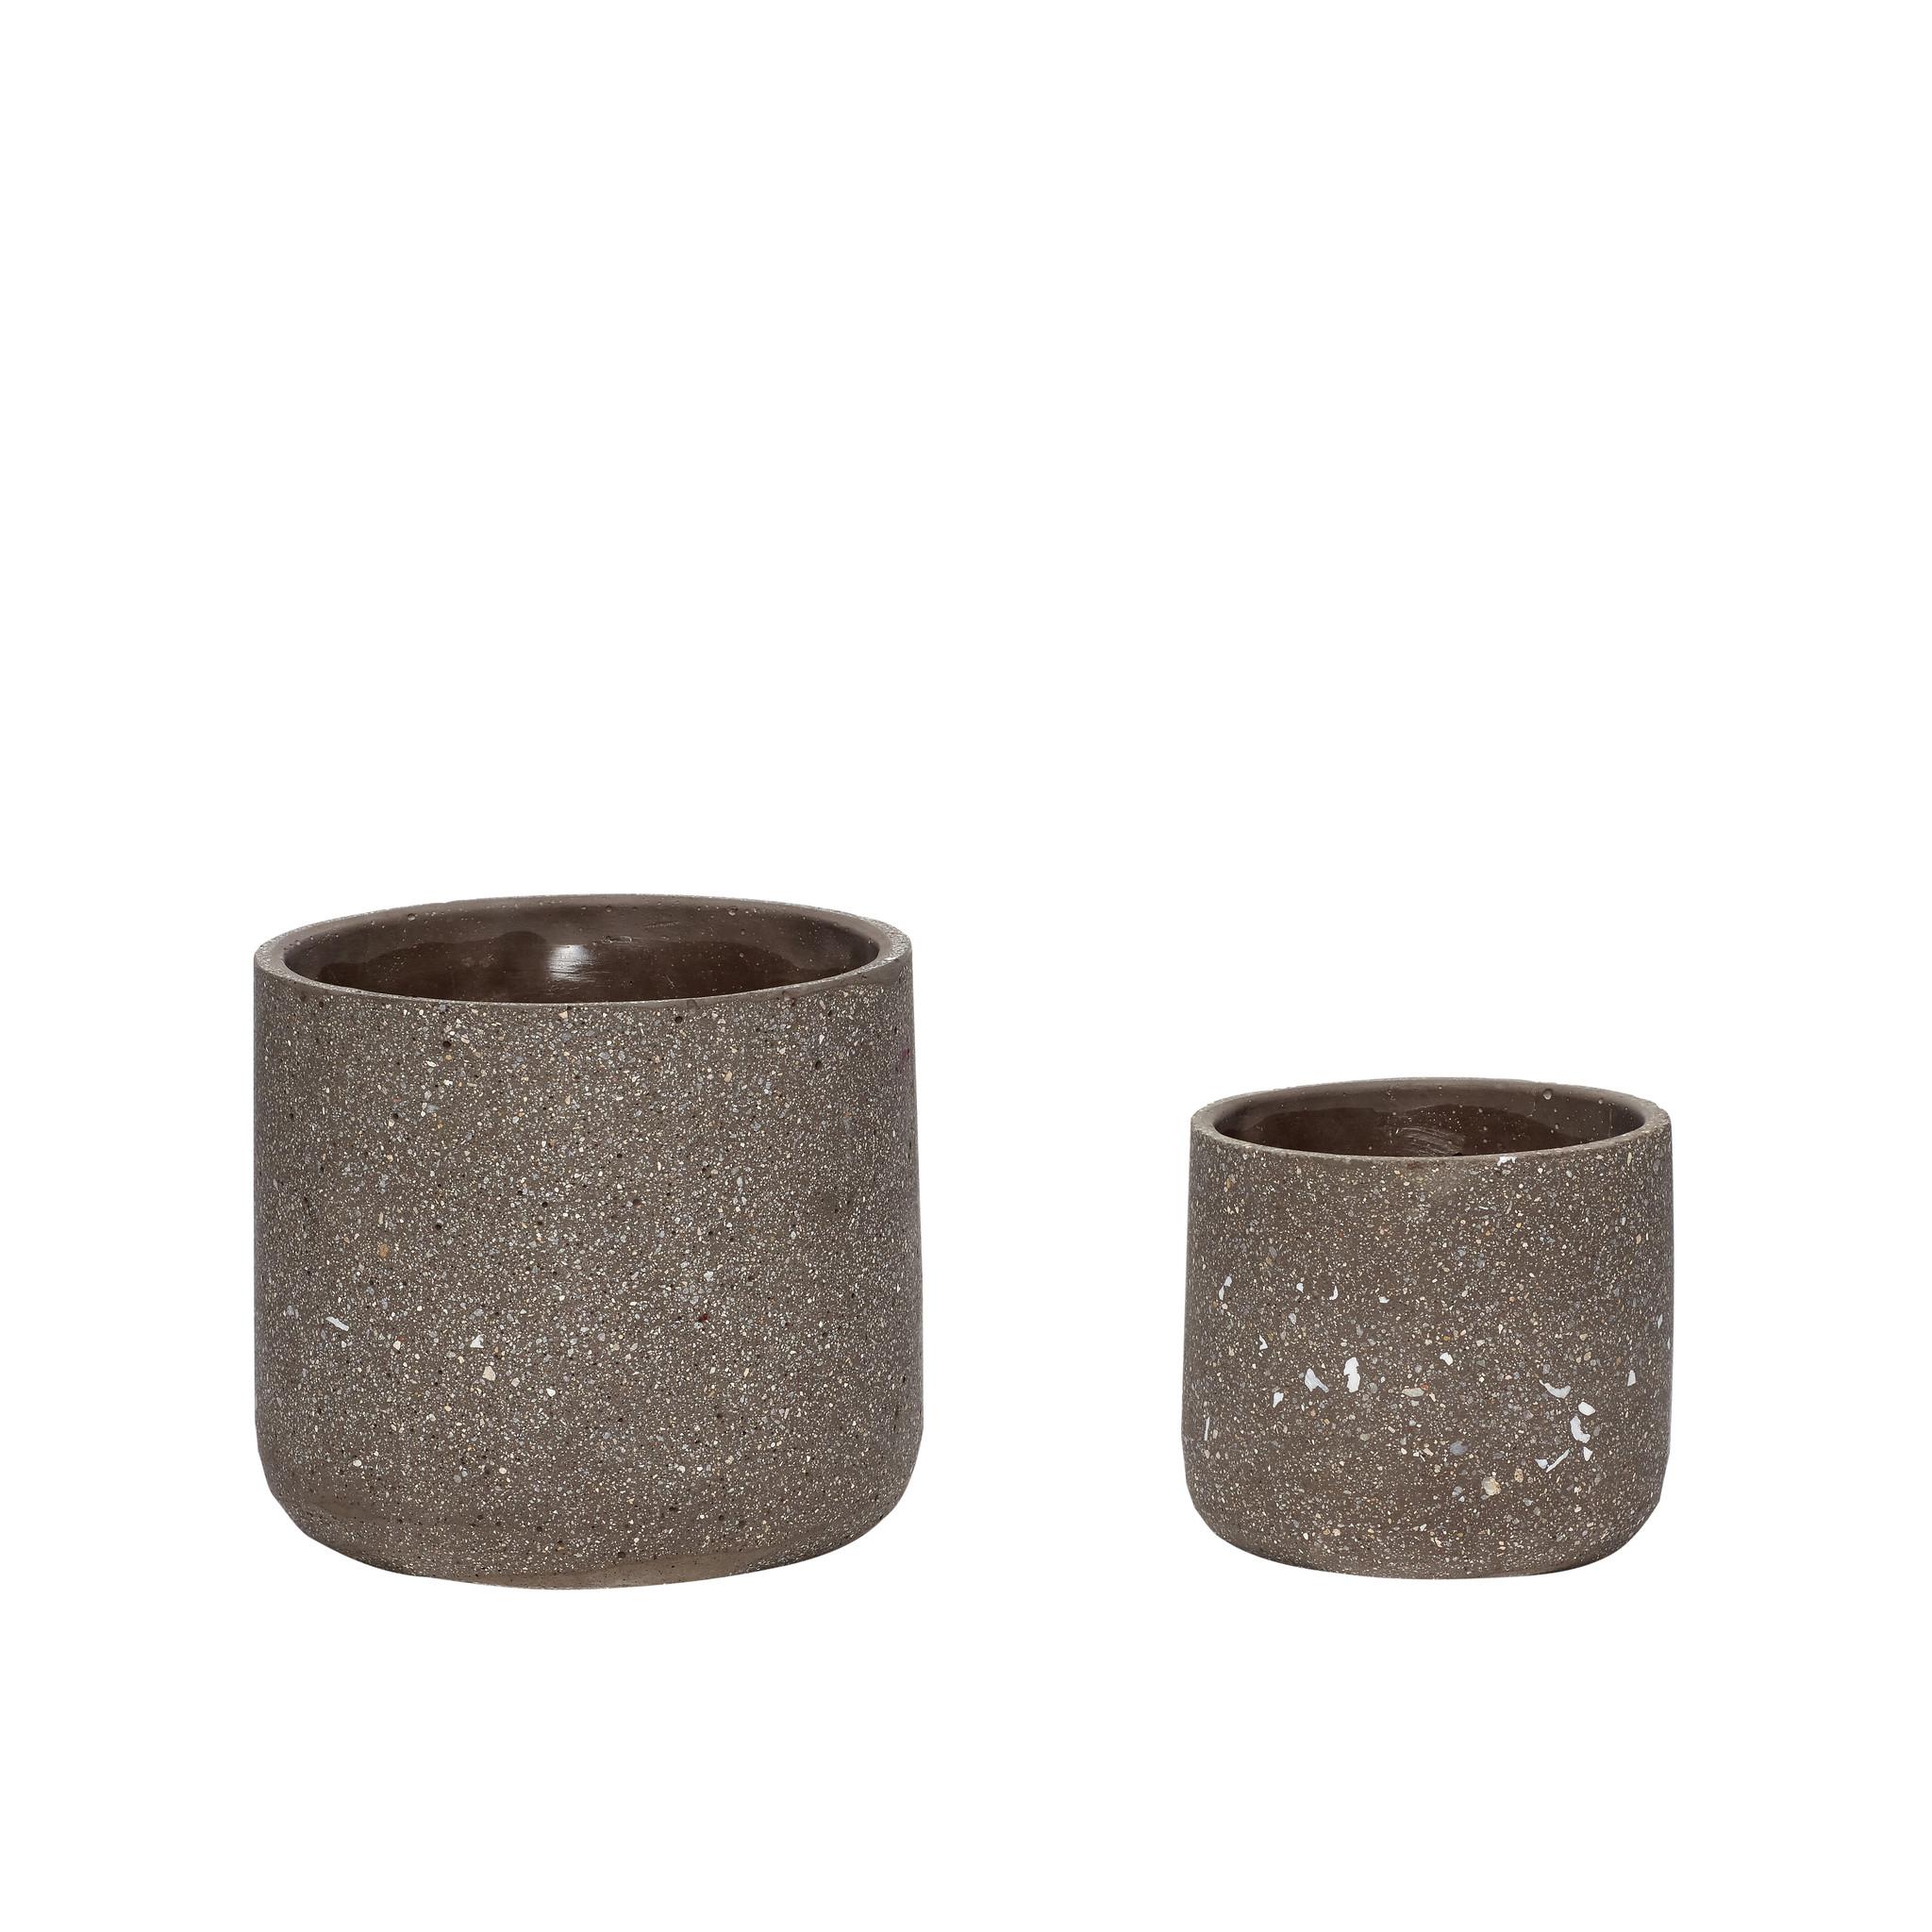 Hubsch Pot, beton, donkergrijs, set van 2-760501-5712772059524